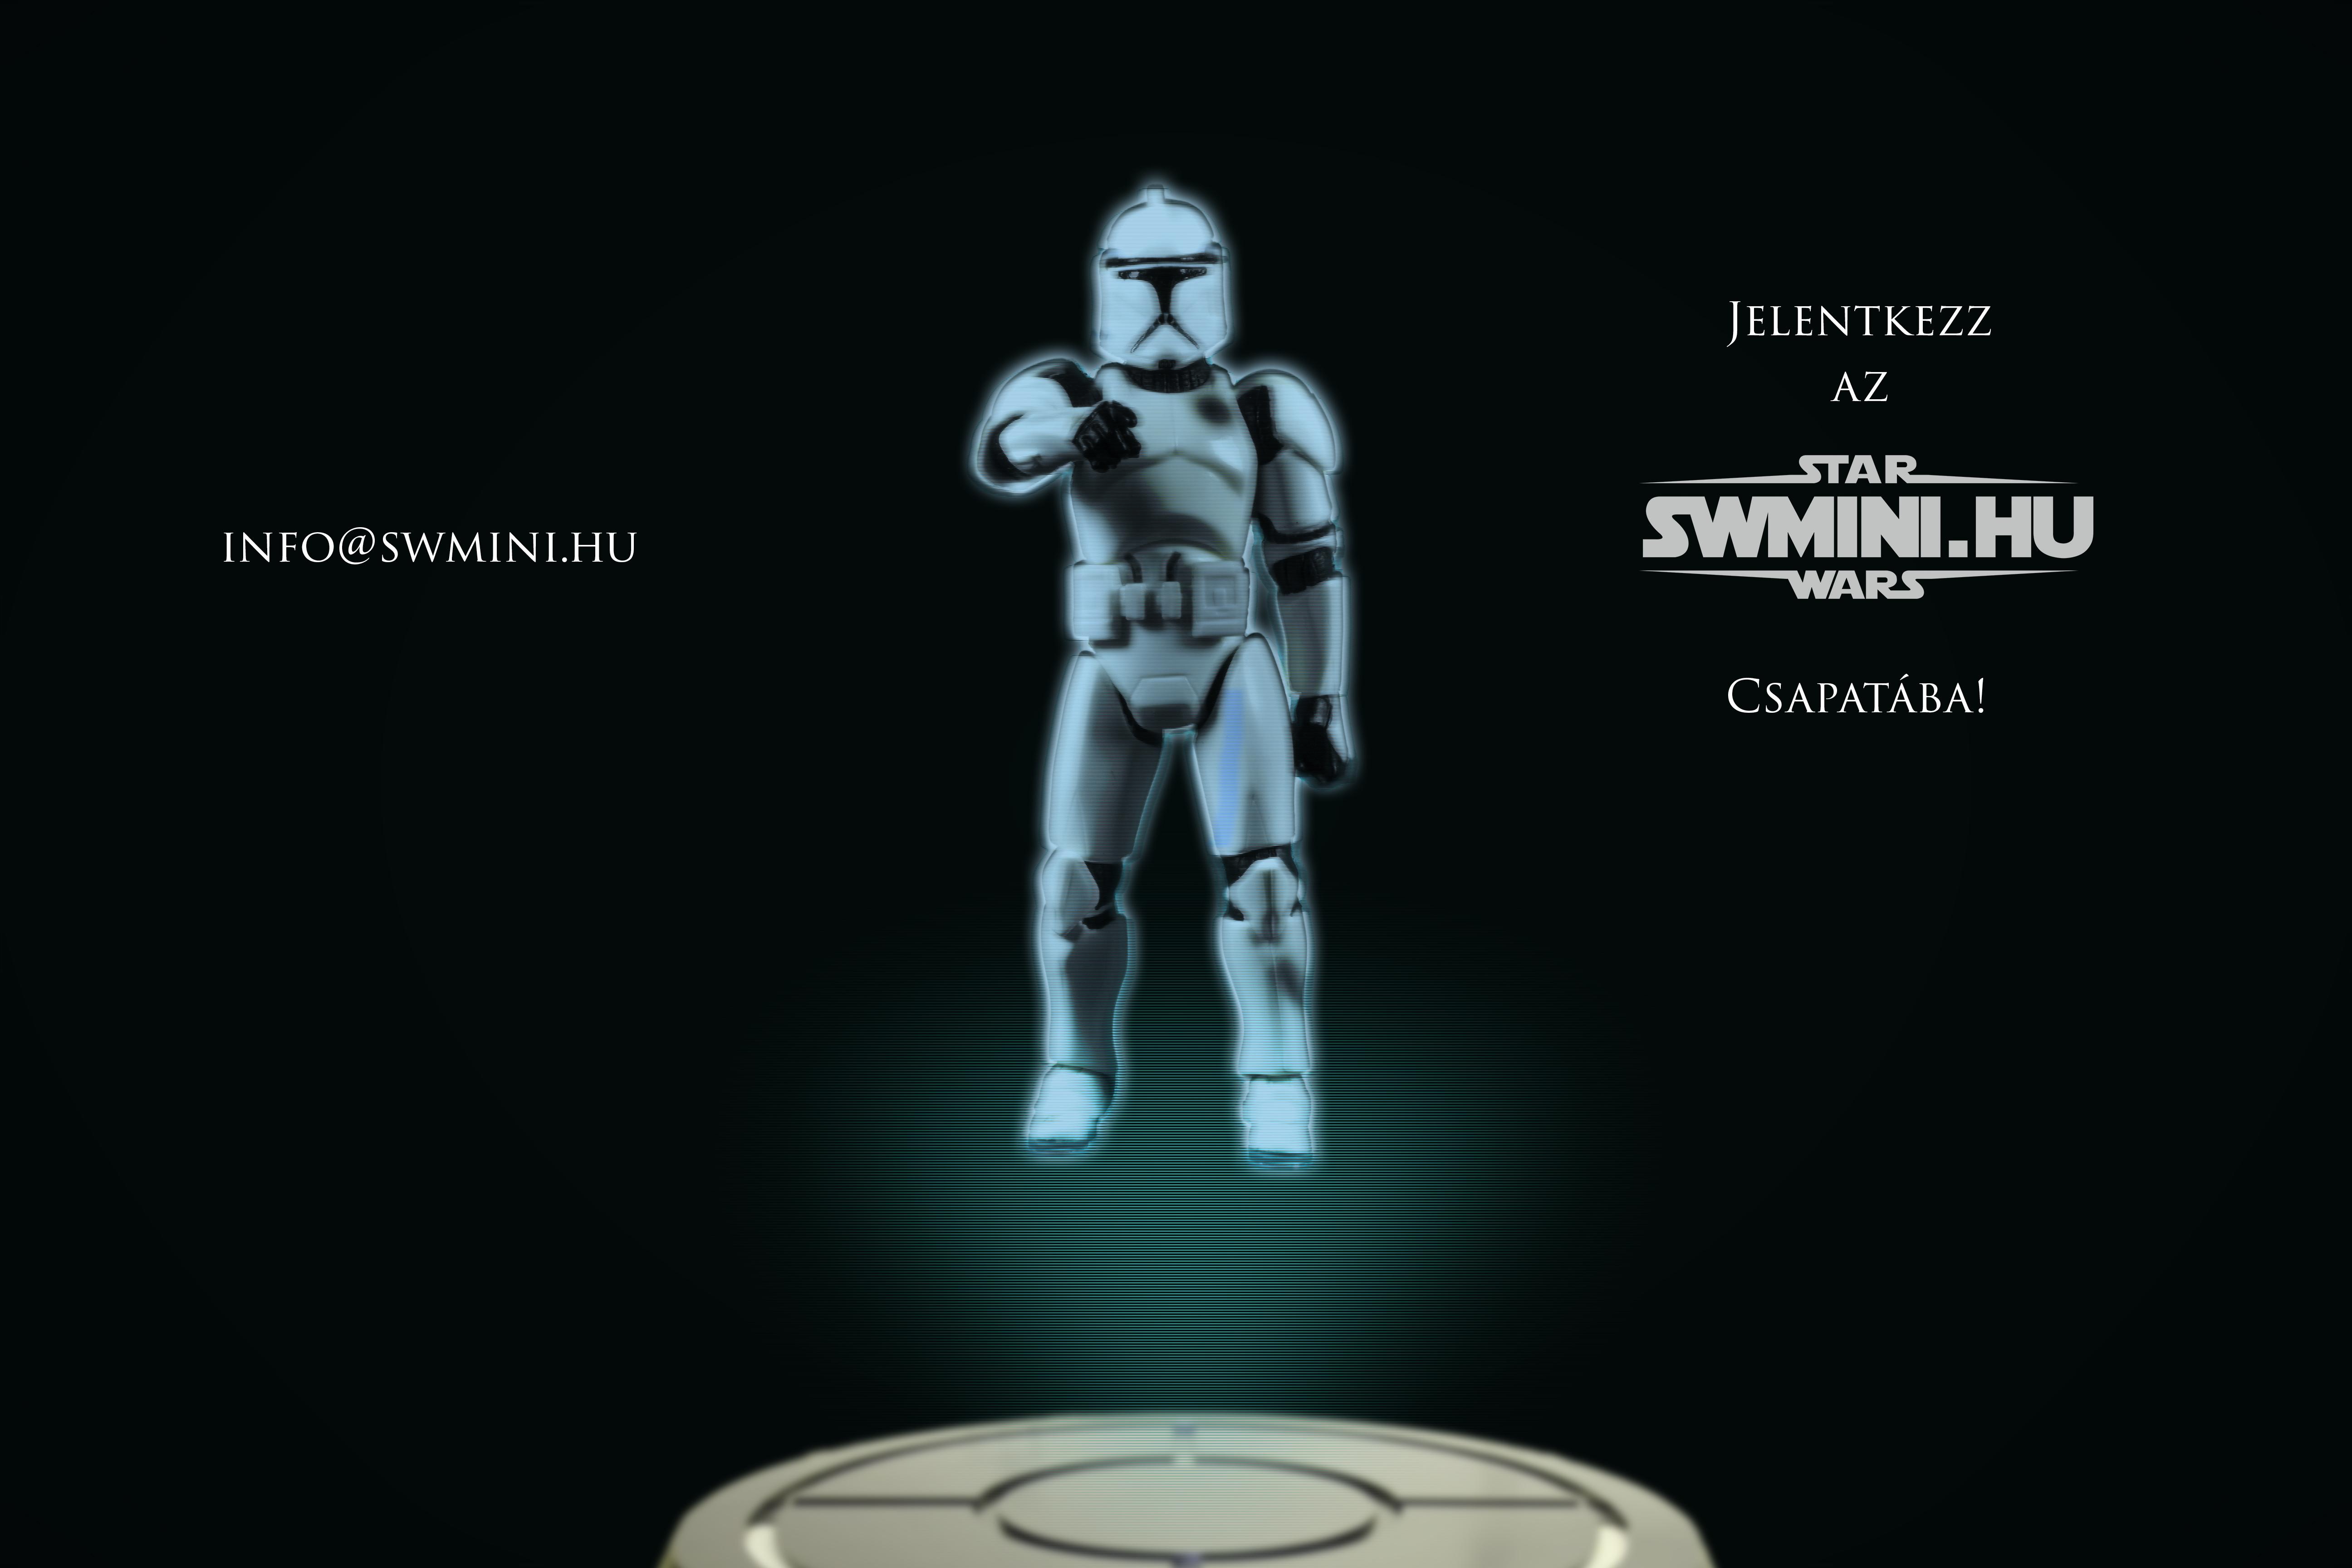 hologram_2_swmini